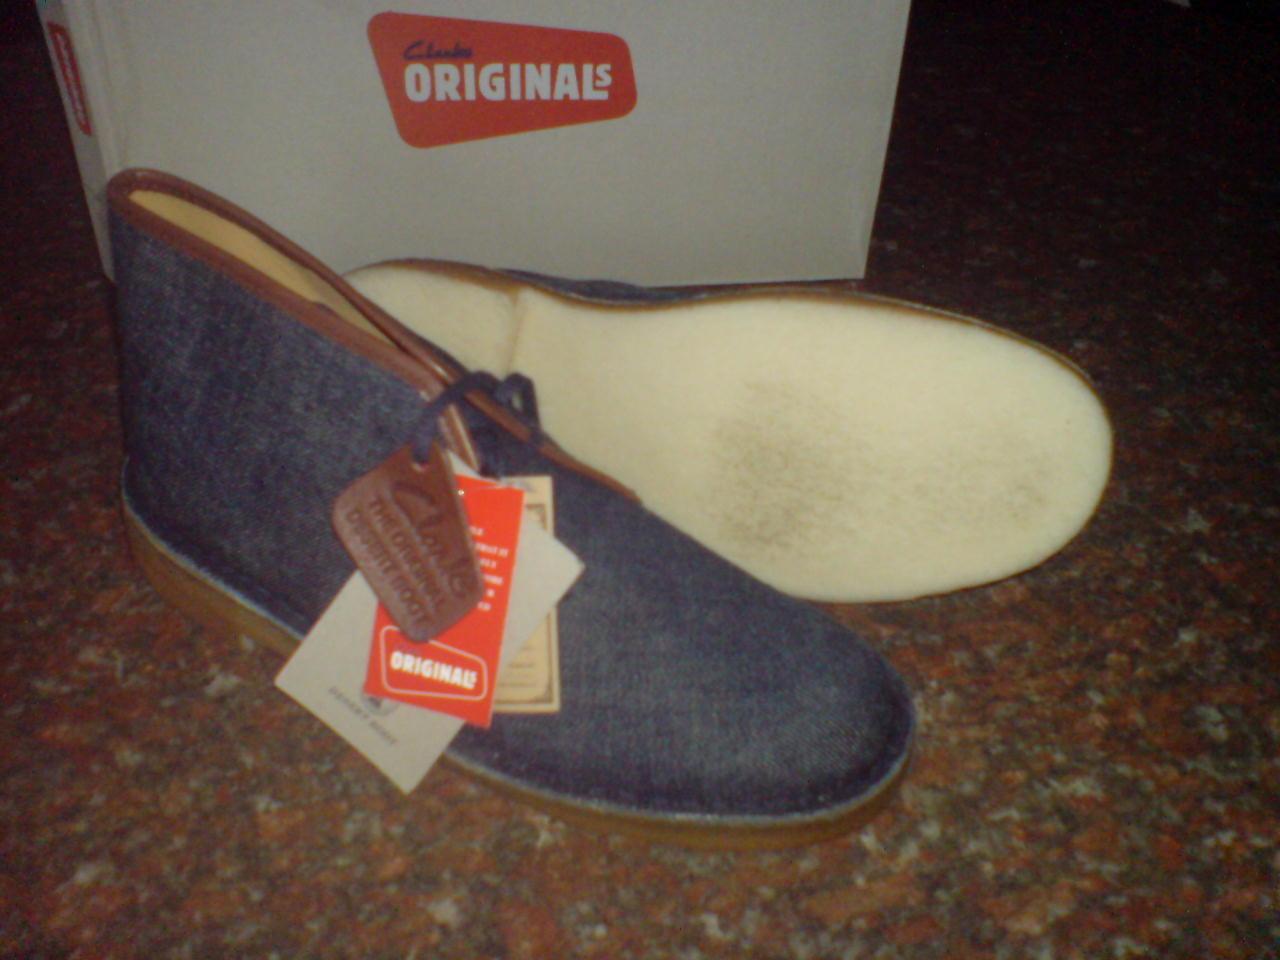 New Clarks OriginalS   Herren  DESERT Stiefel  INDIGO DENIM  UK 6,7,8,9,10,11 F